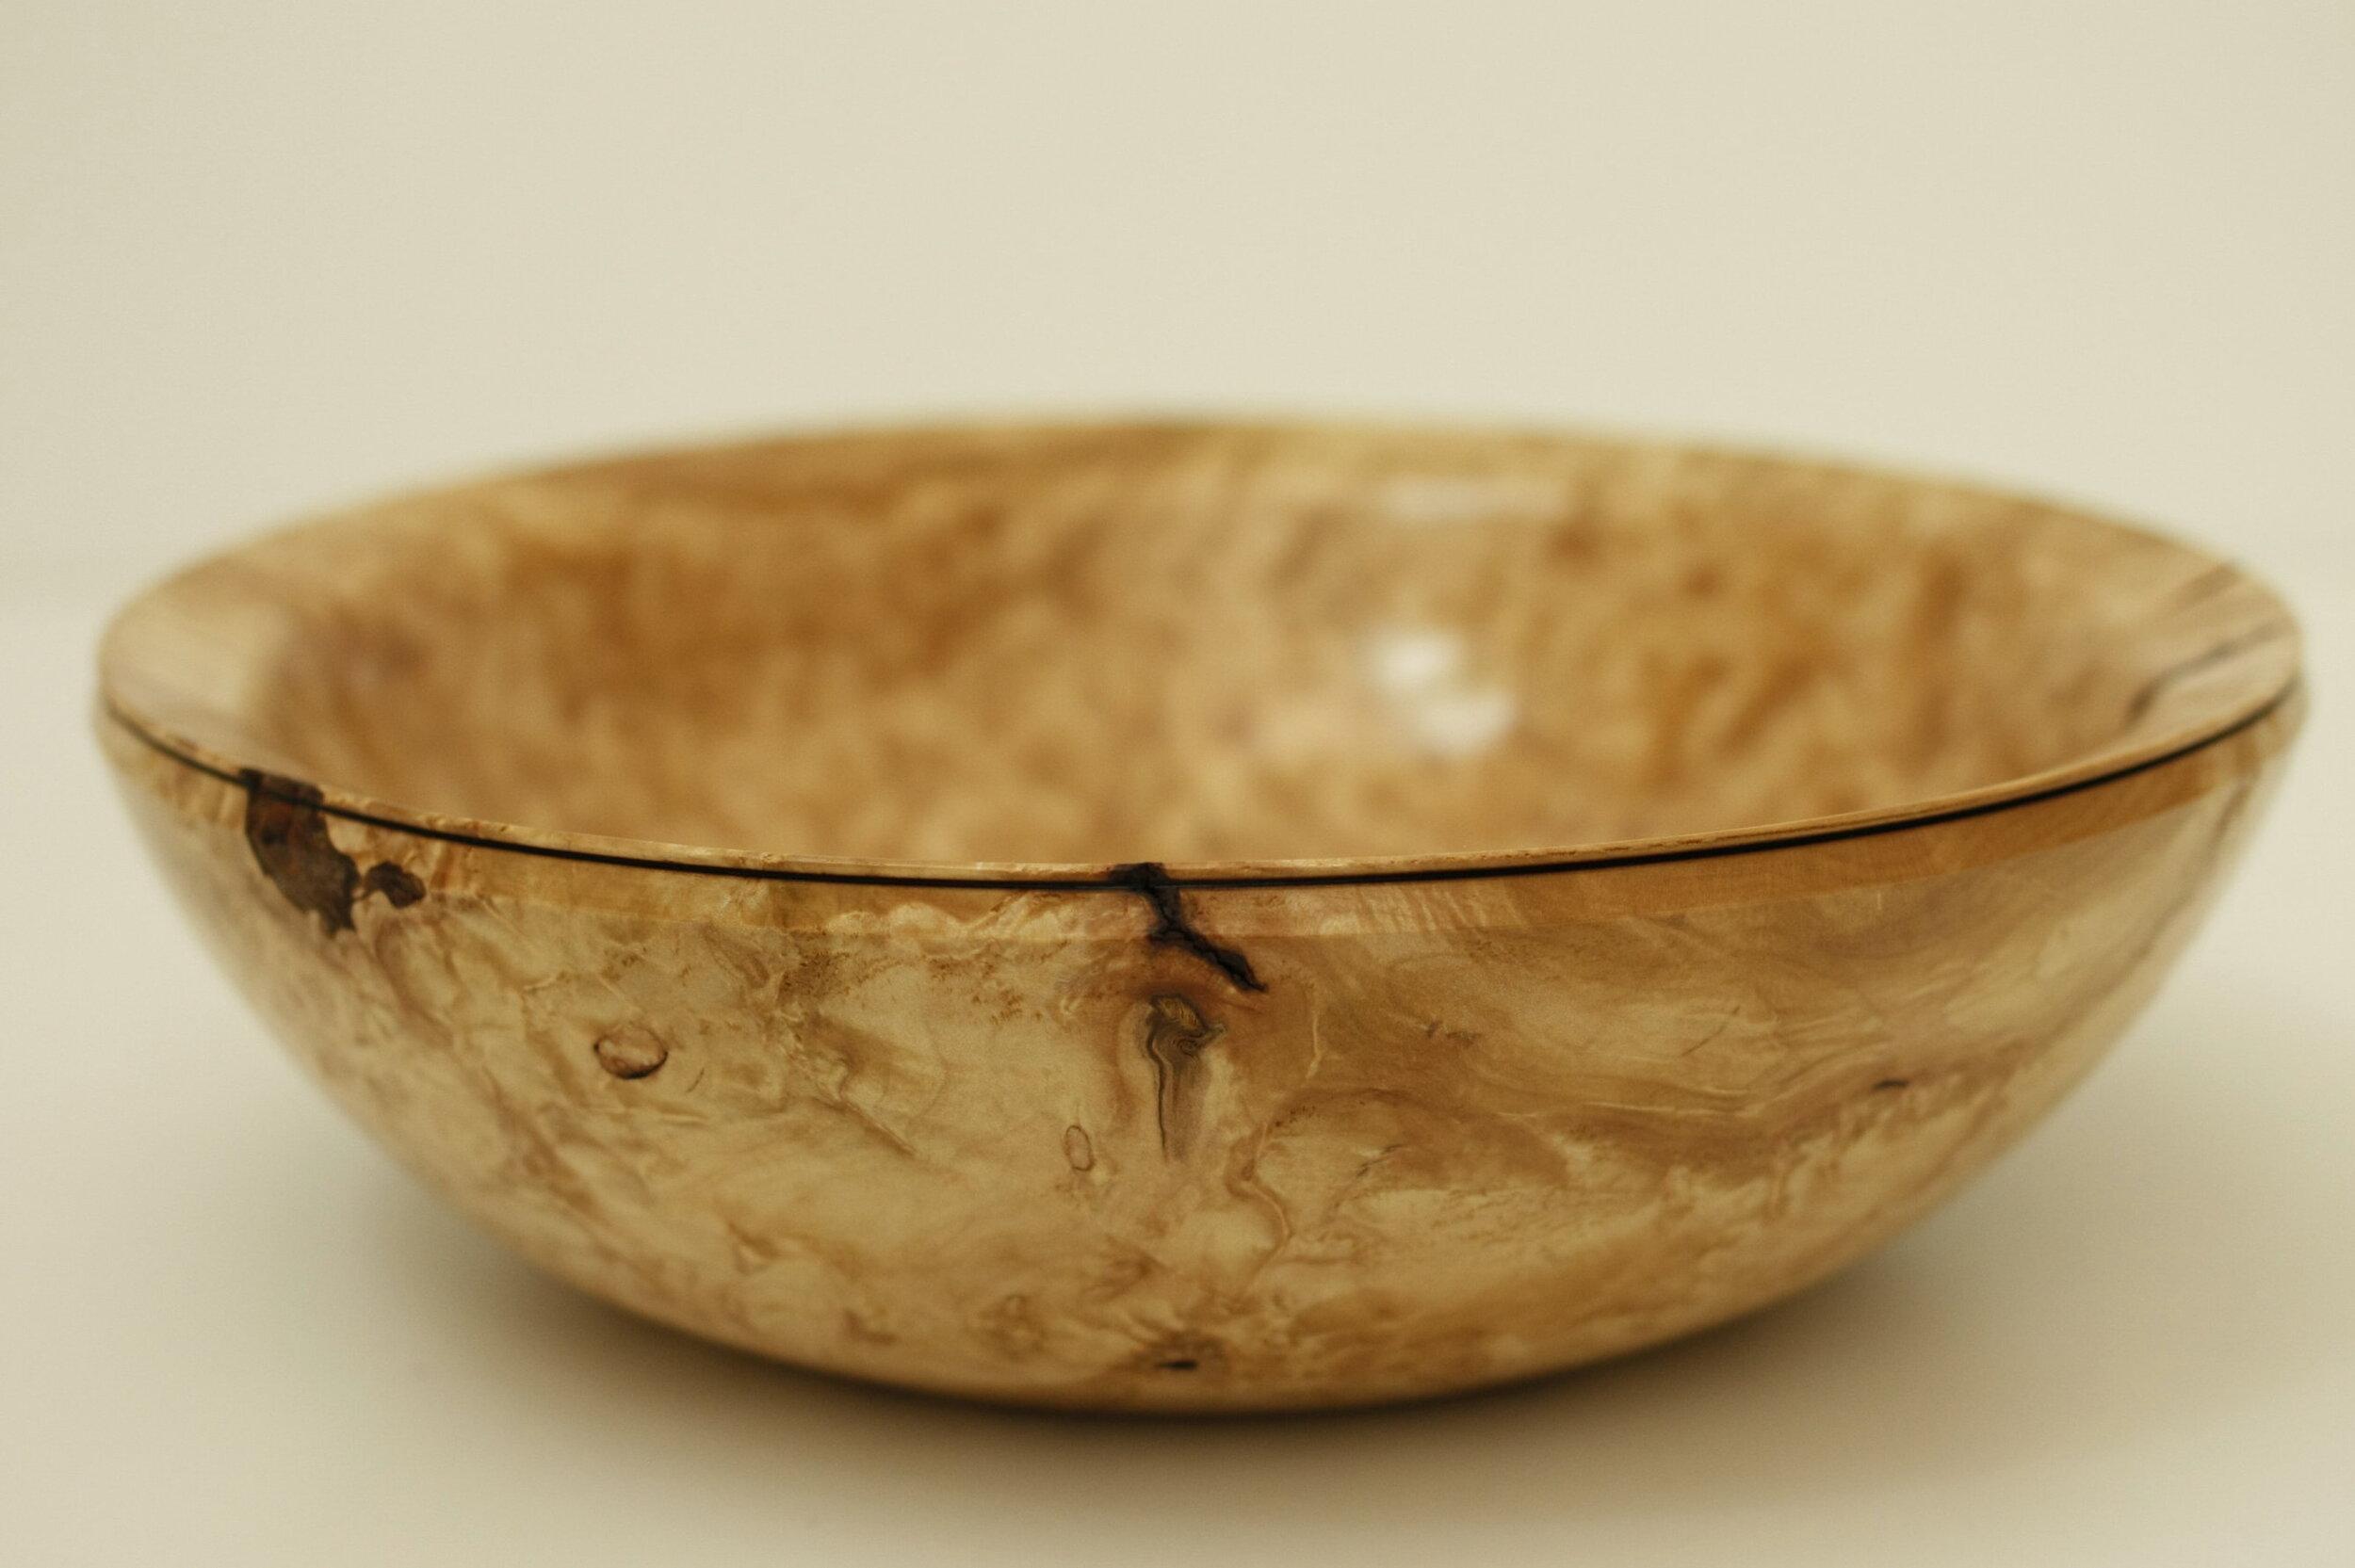 Joseph mcgill - maple burl bowl.jpg